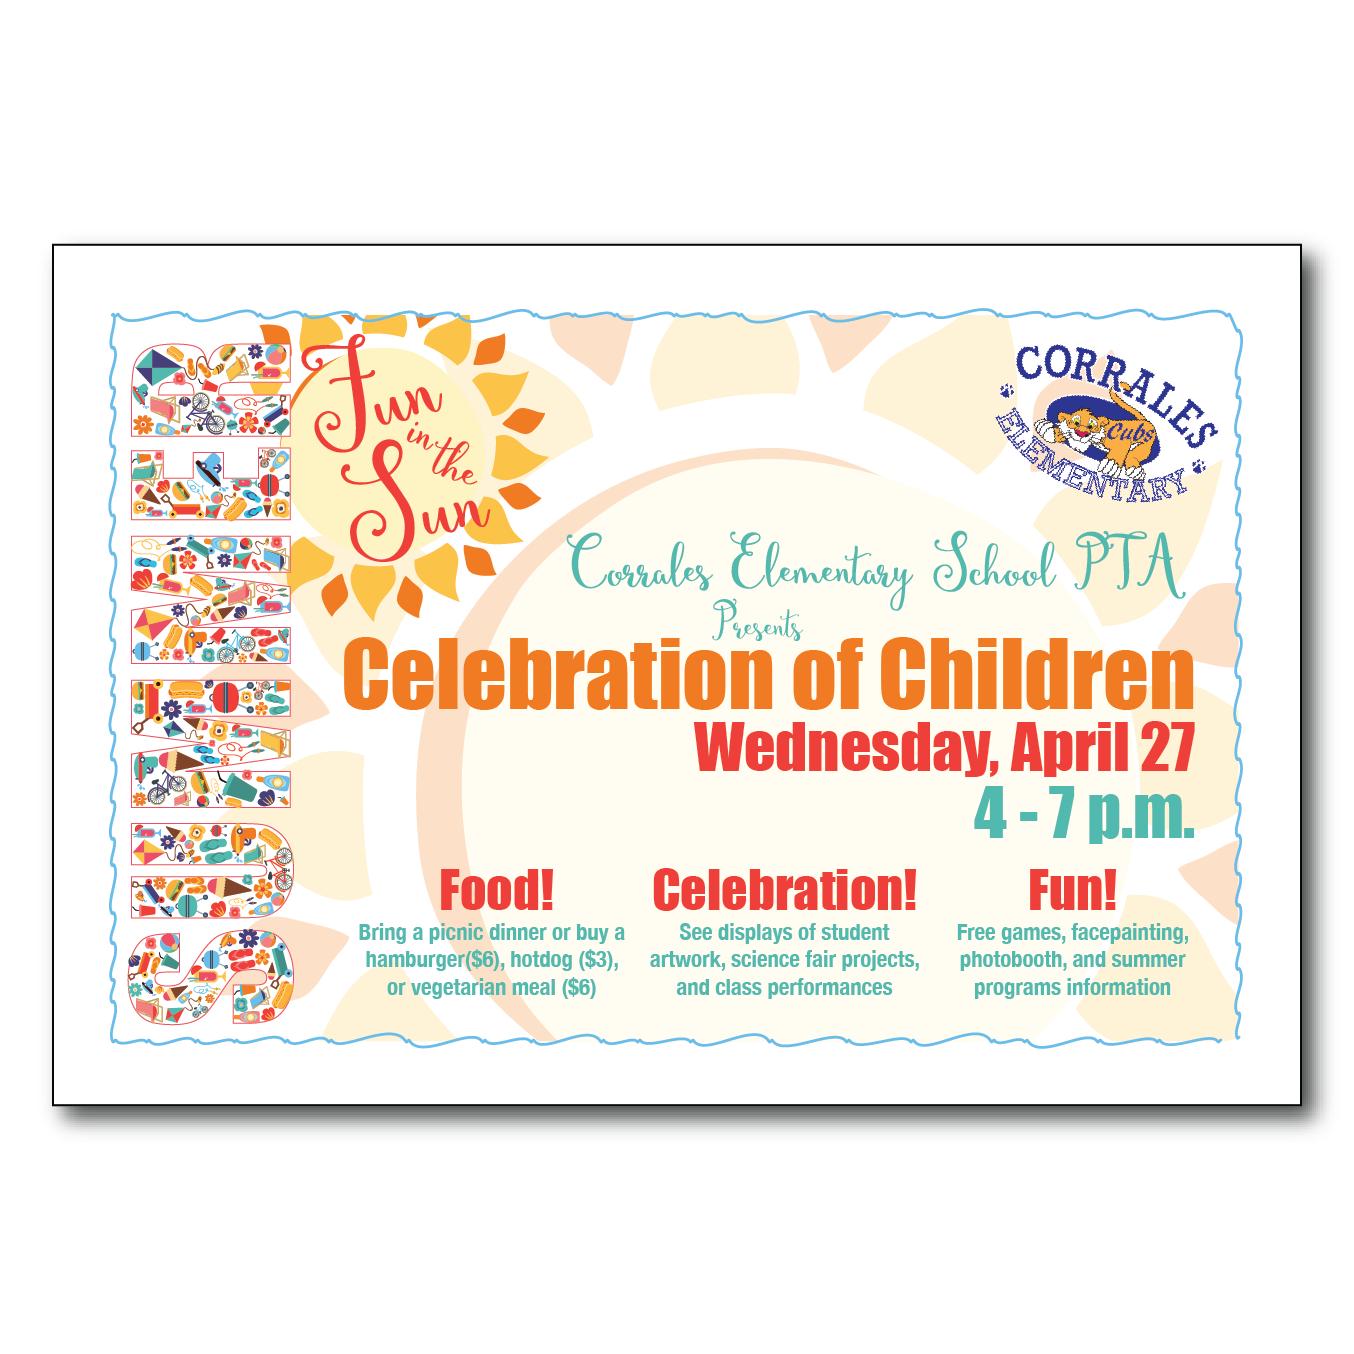 Celebration of Children Flyer #1